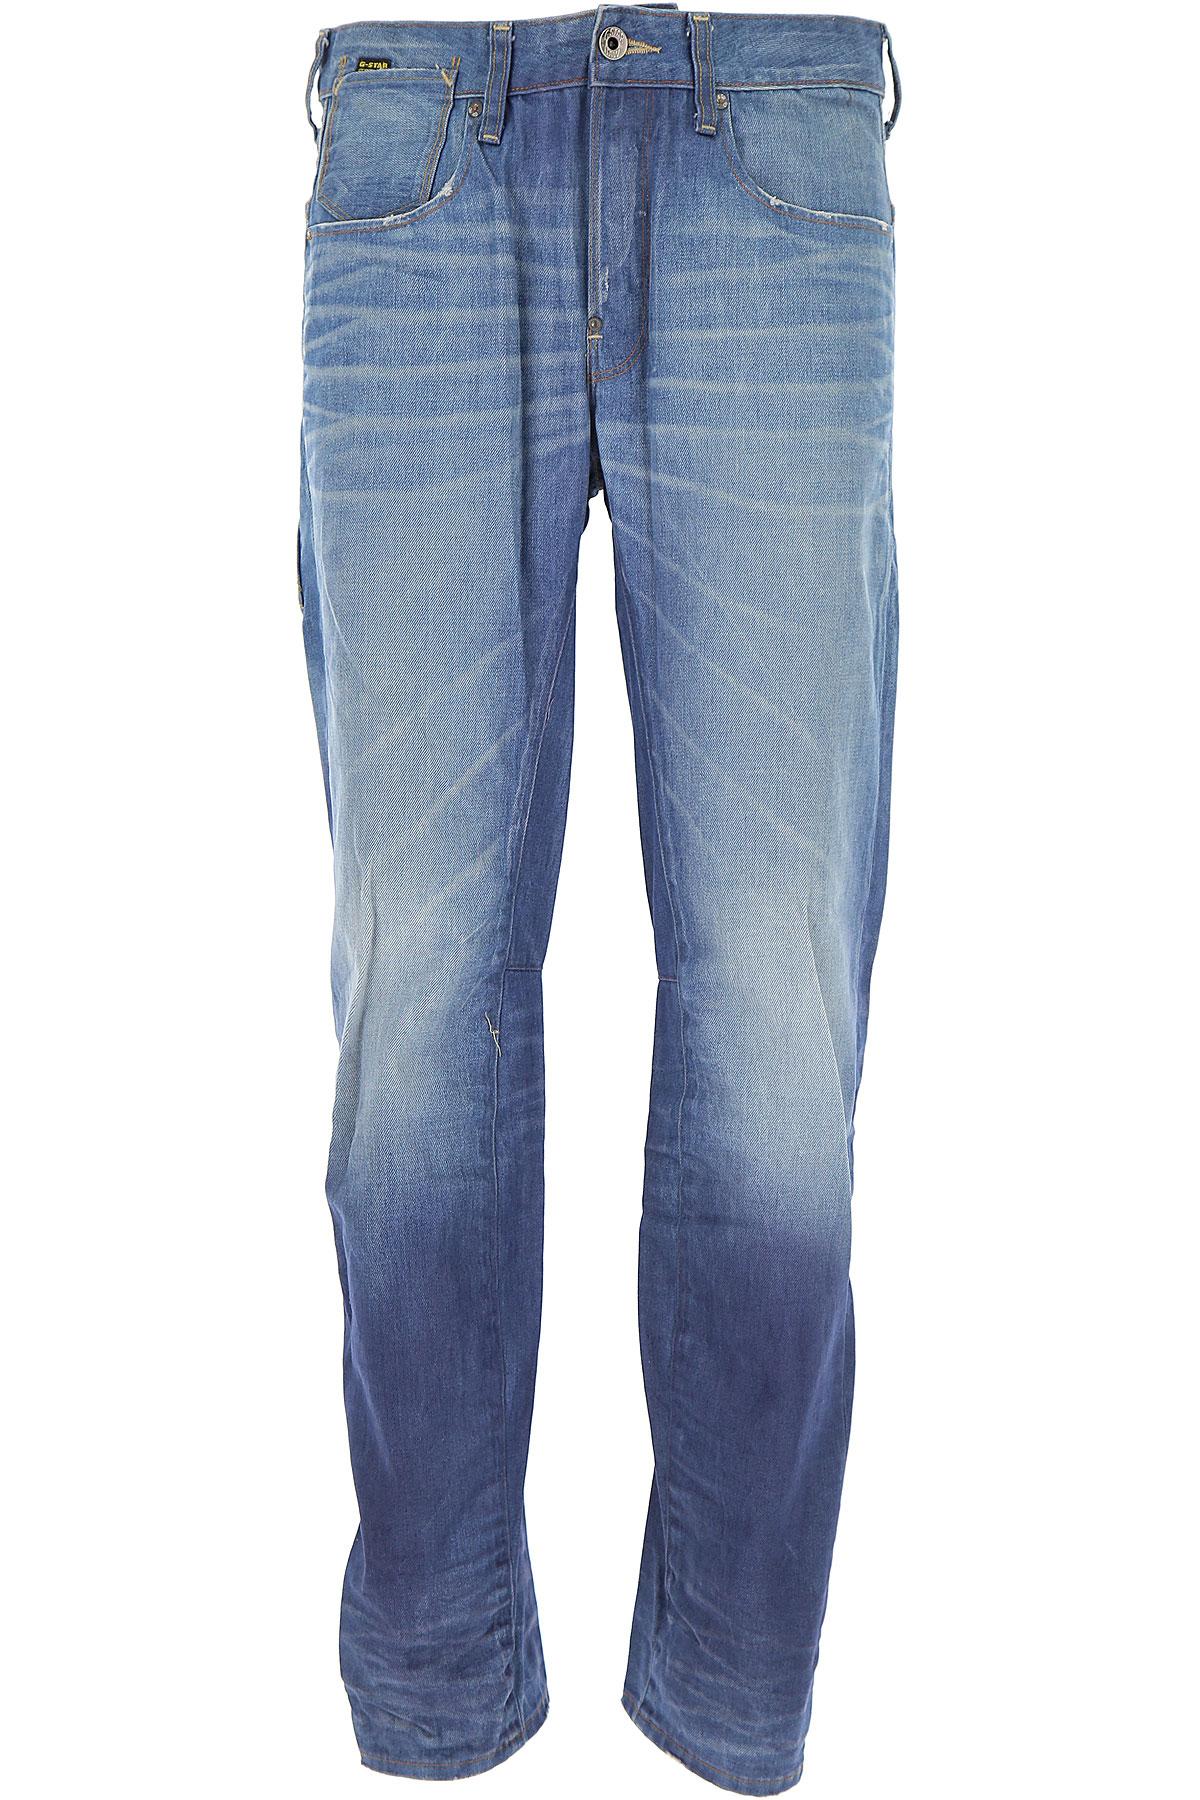 Image of G-Star Jeans On Sale, Denim Light Blue, Cotton, 2017, 31 33